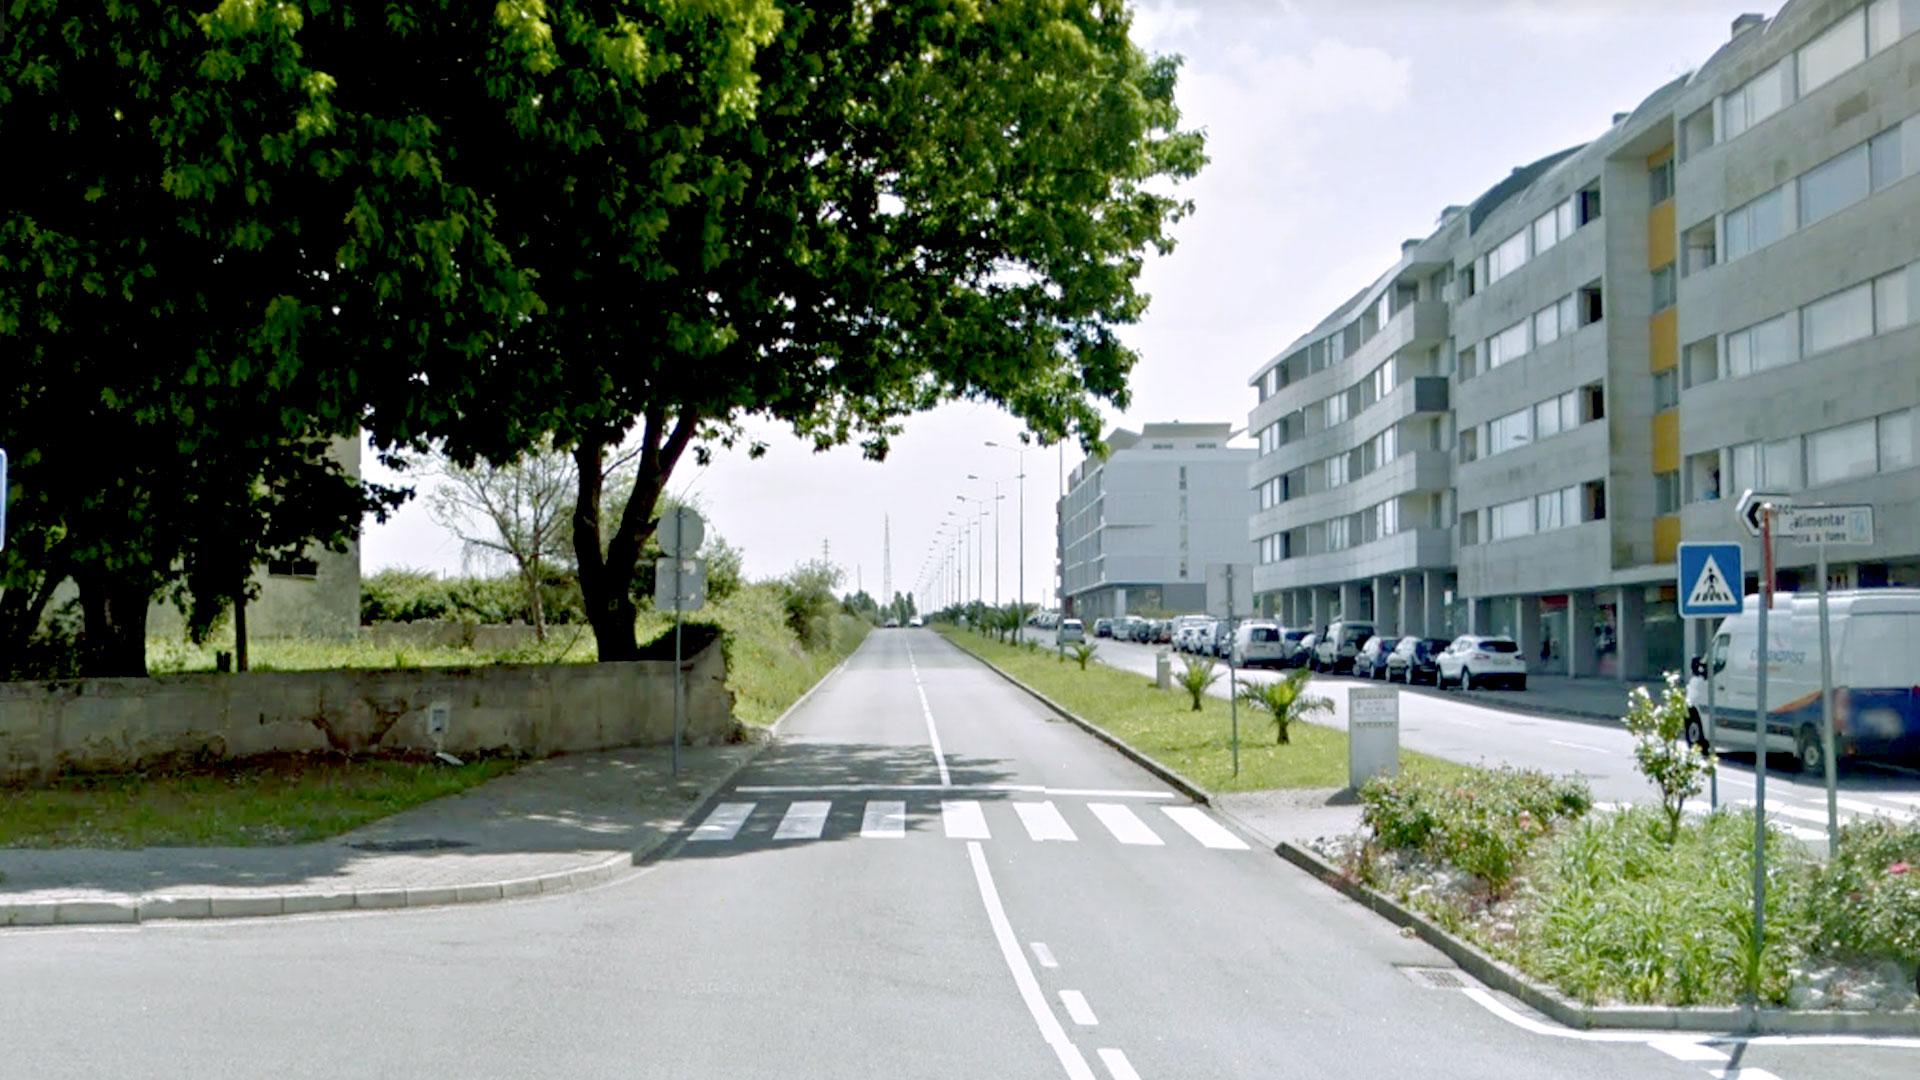 Forca-vouga-vera-cruz-Aveiro-ville-real-estate-imobiliaria-comprar-arrendar-vender-moradia-apartamento-casa-t0-t1-t2-t3-t4-3